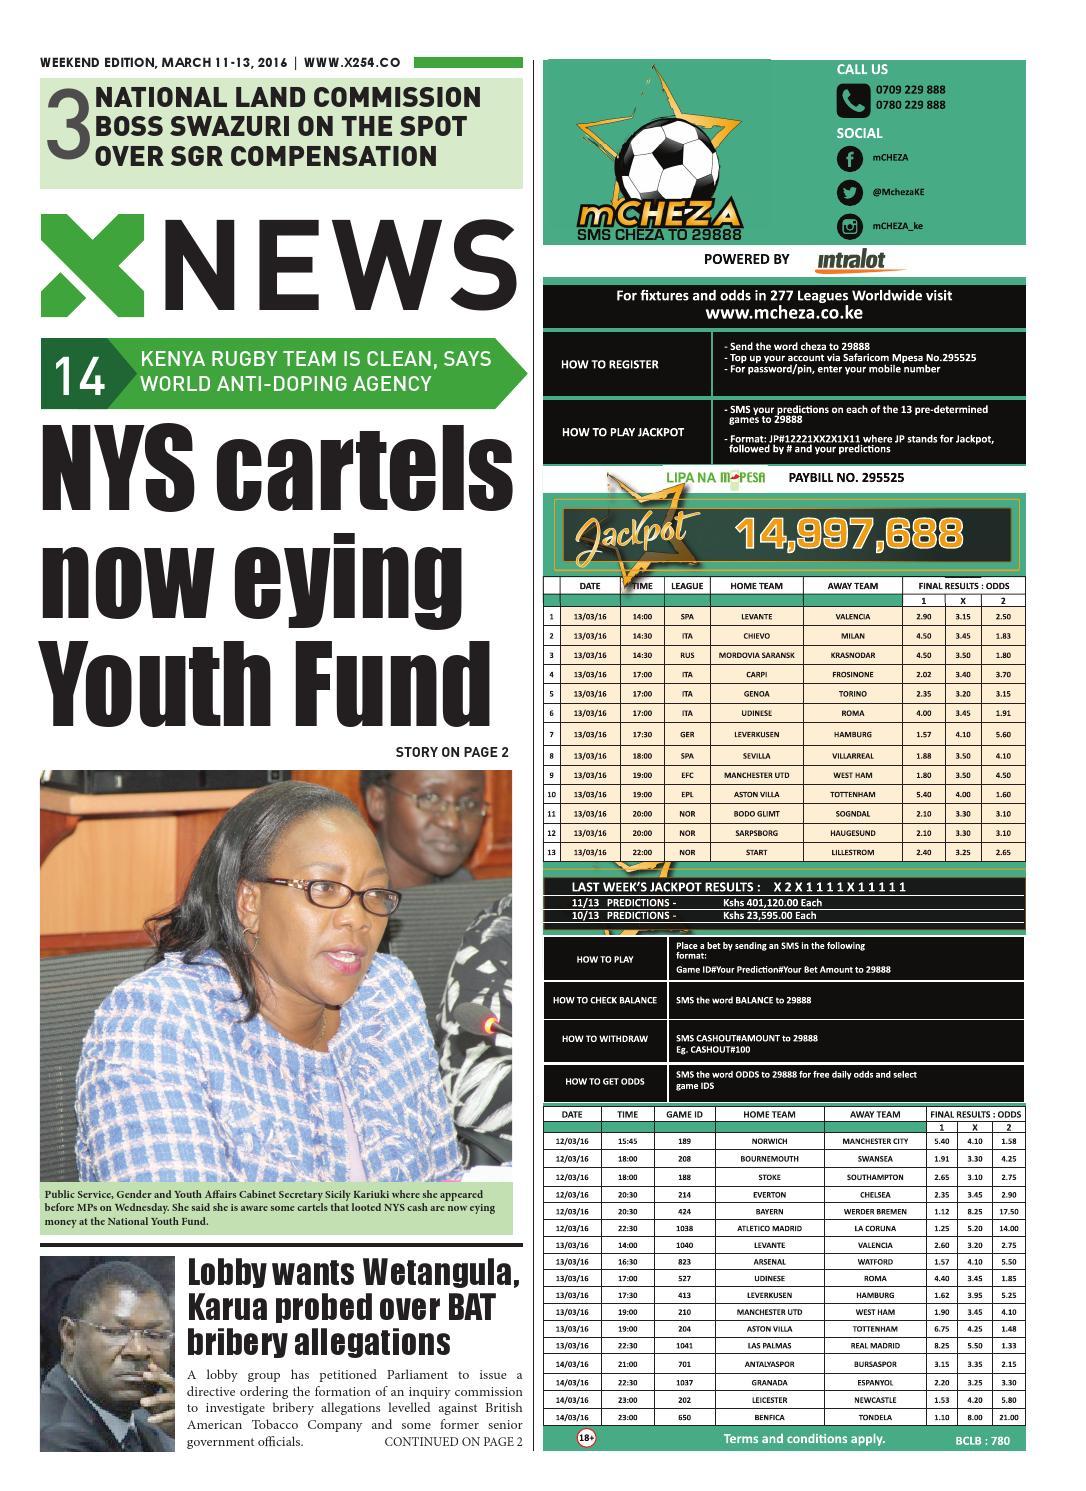 201603011 xnews by X News - issuu